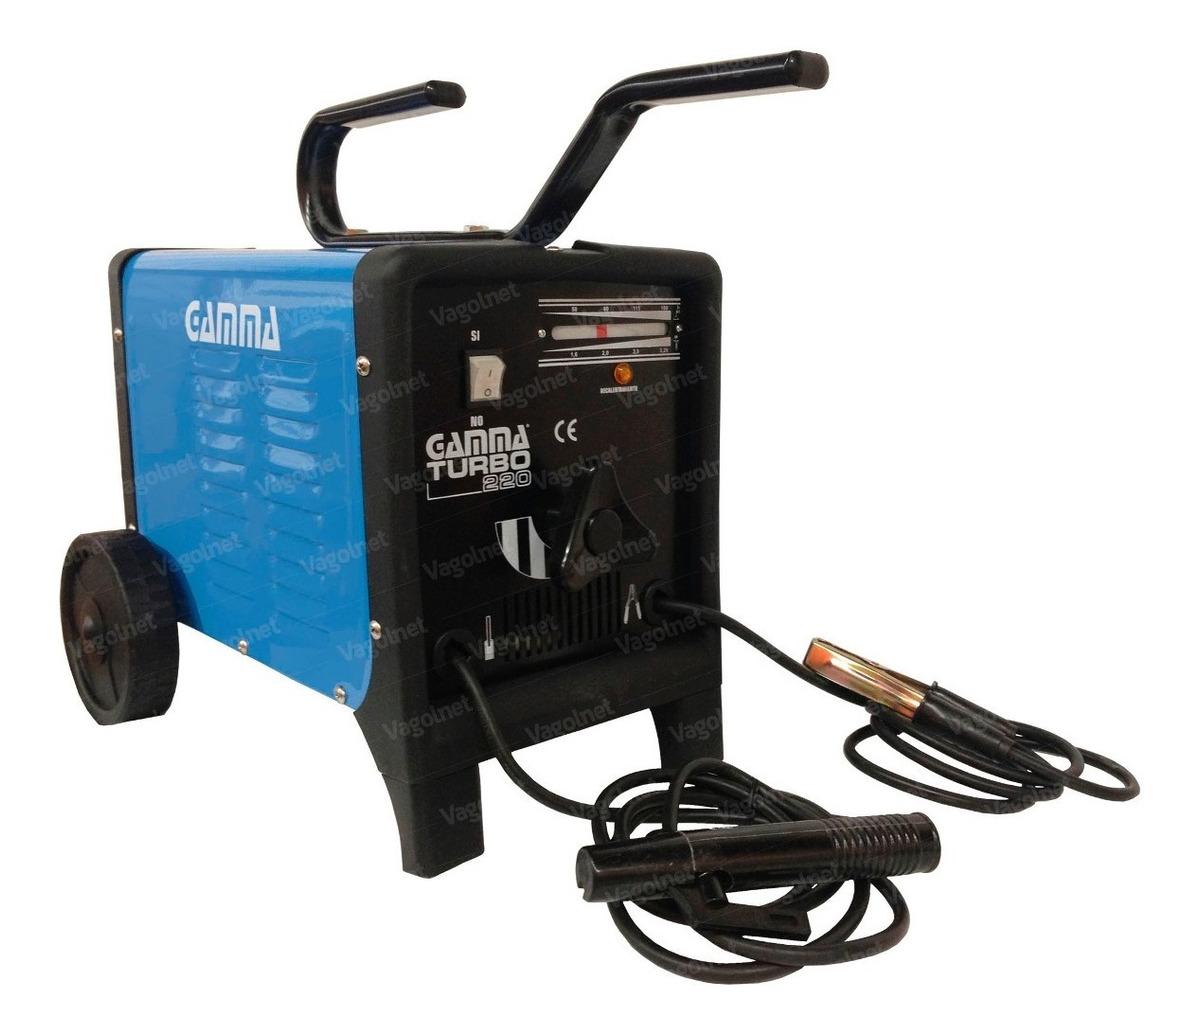 Soldadora 50-180 Amp 1 6 A 4 Mm Turbo 220 Gamma Hot Sale